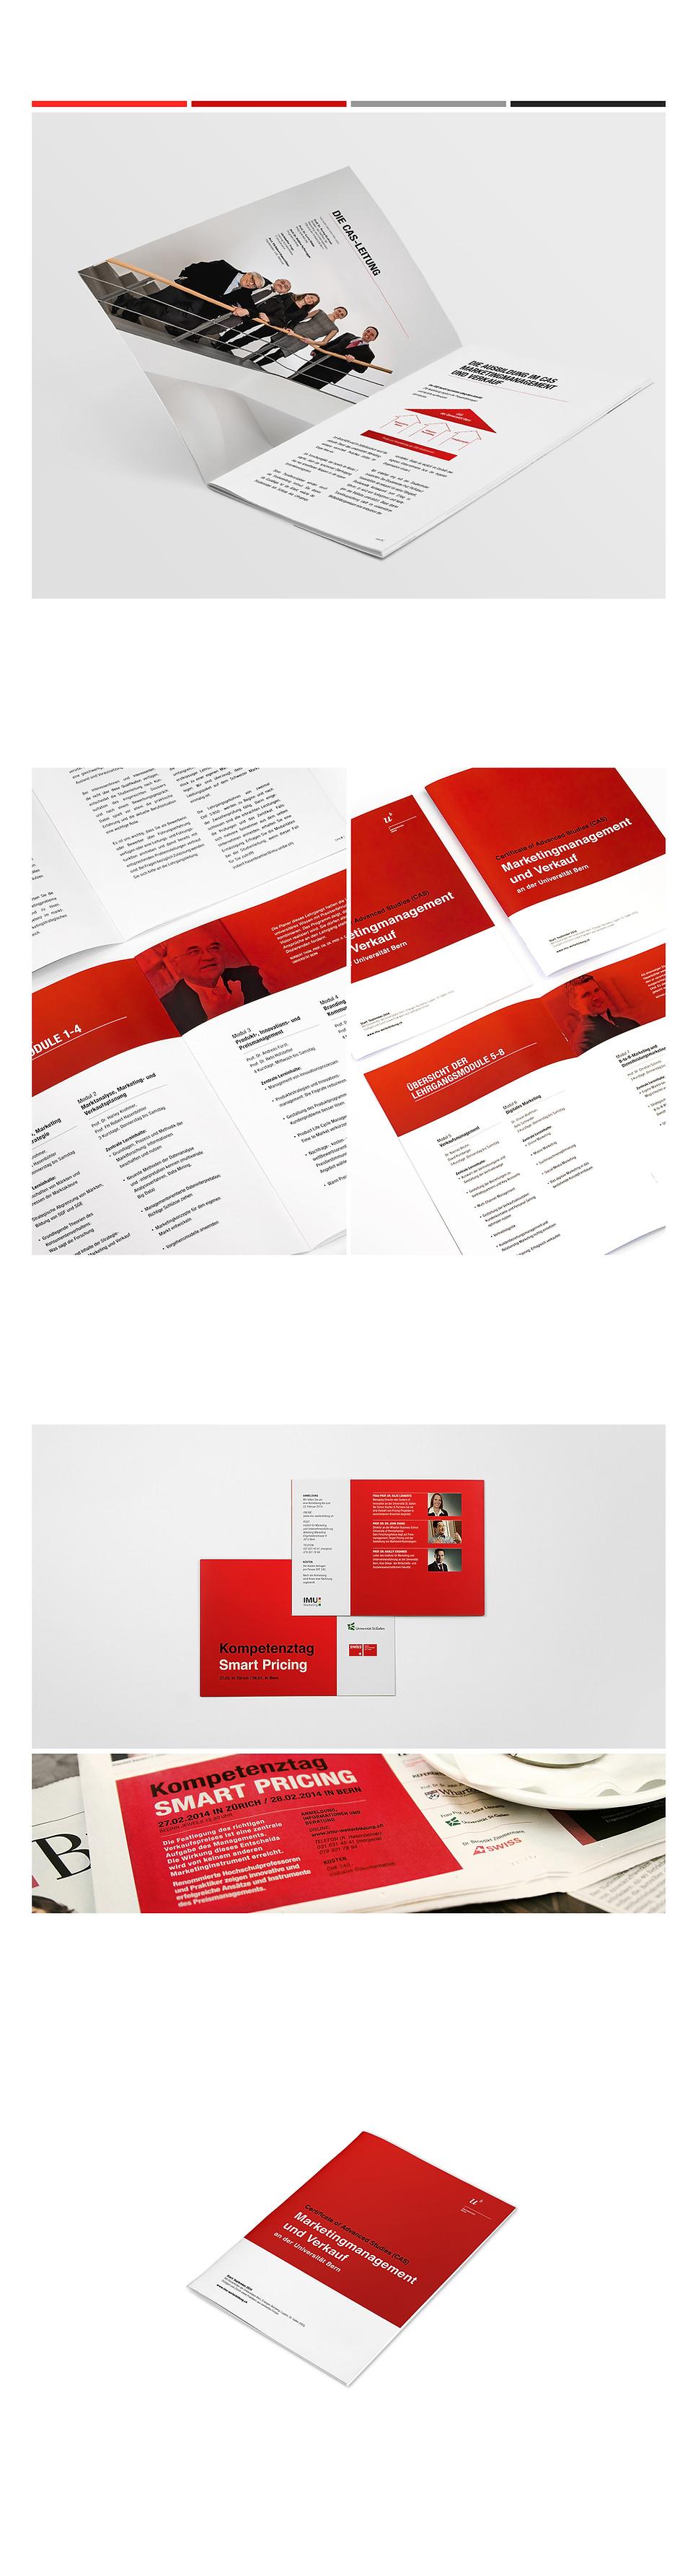 uni-bern-branding-broschuere-design_03.j